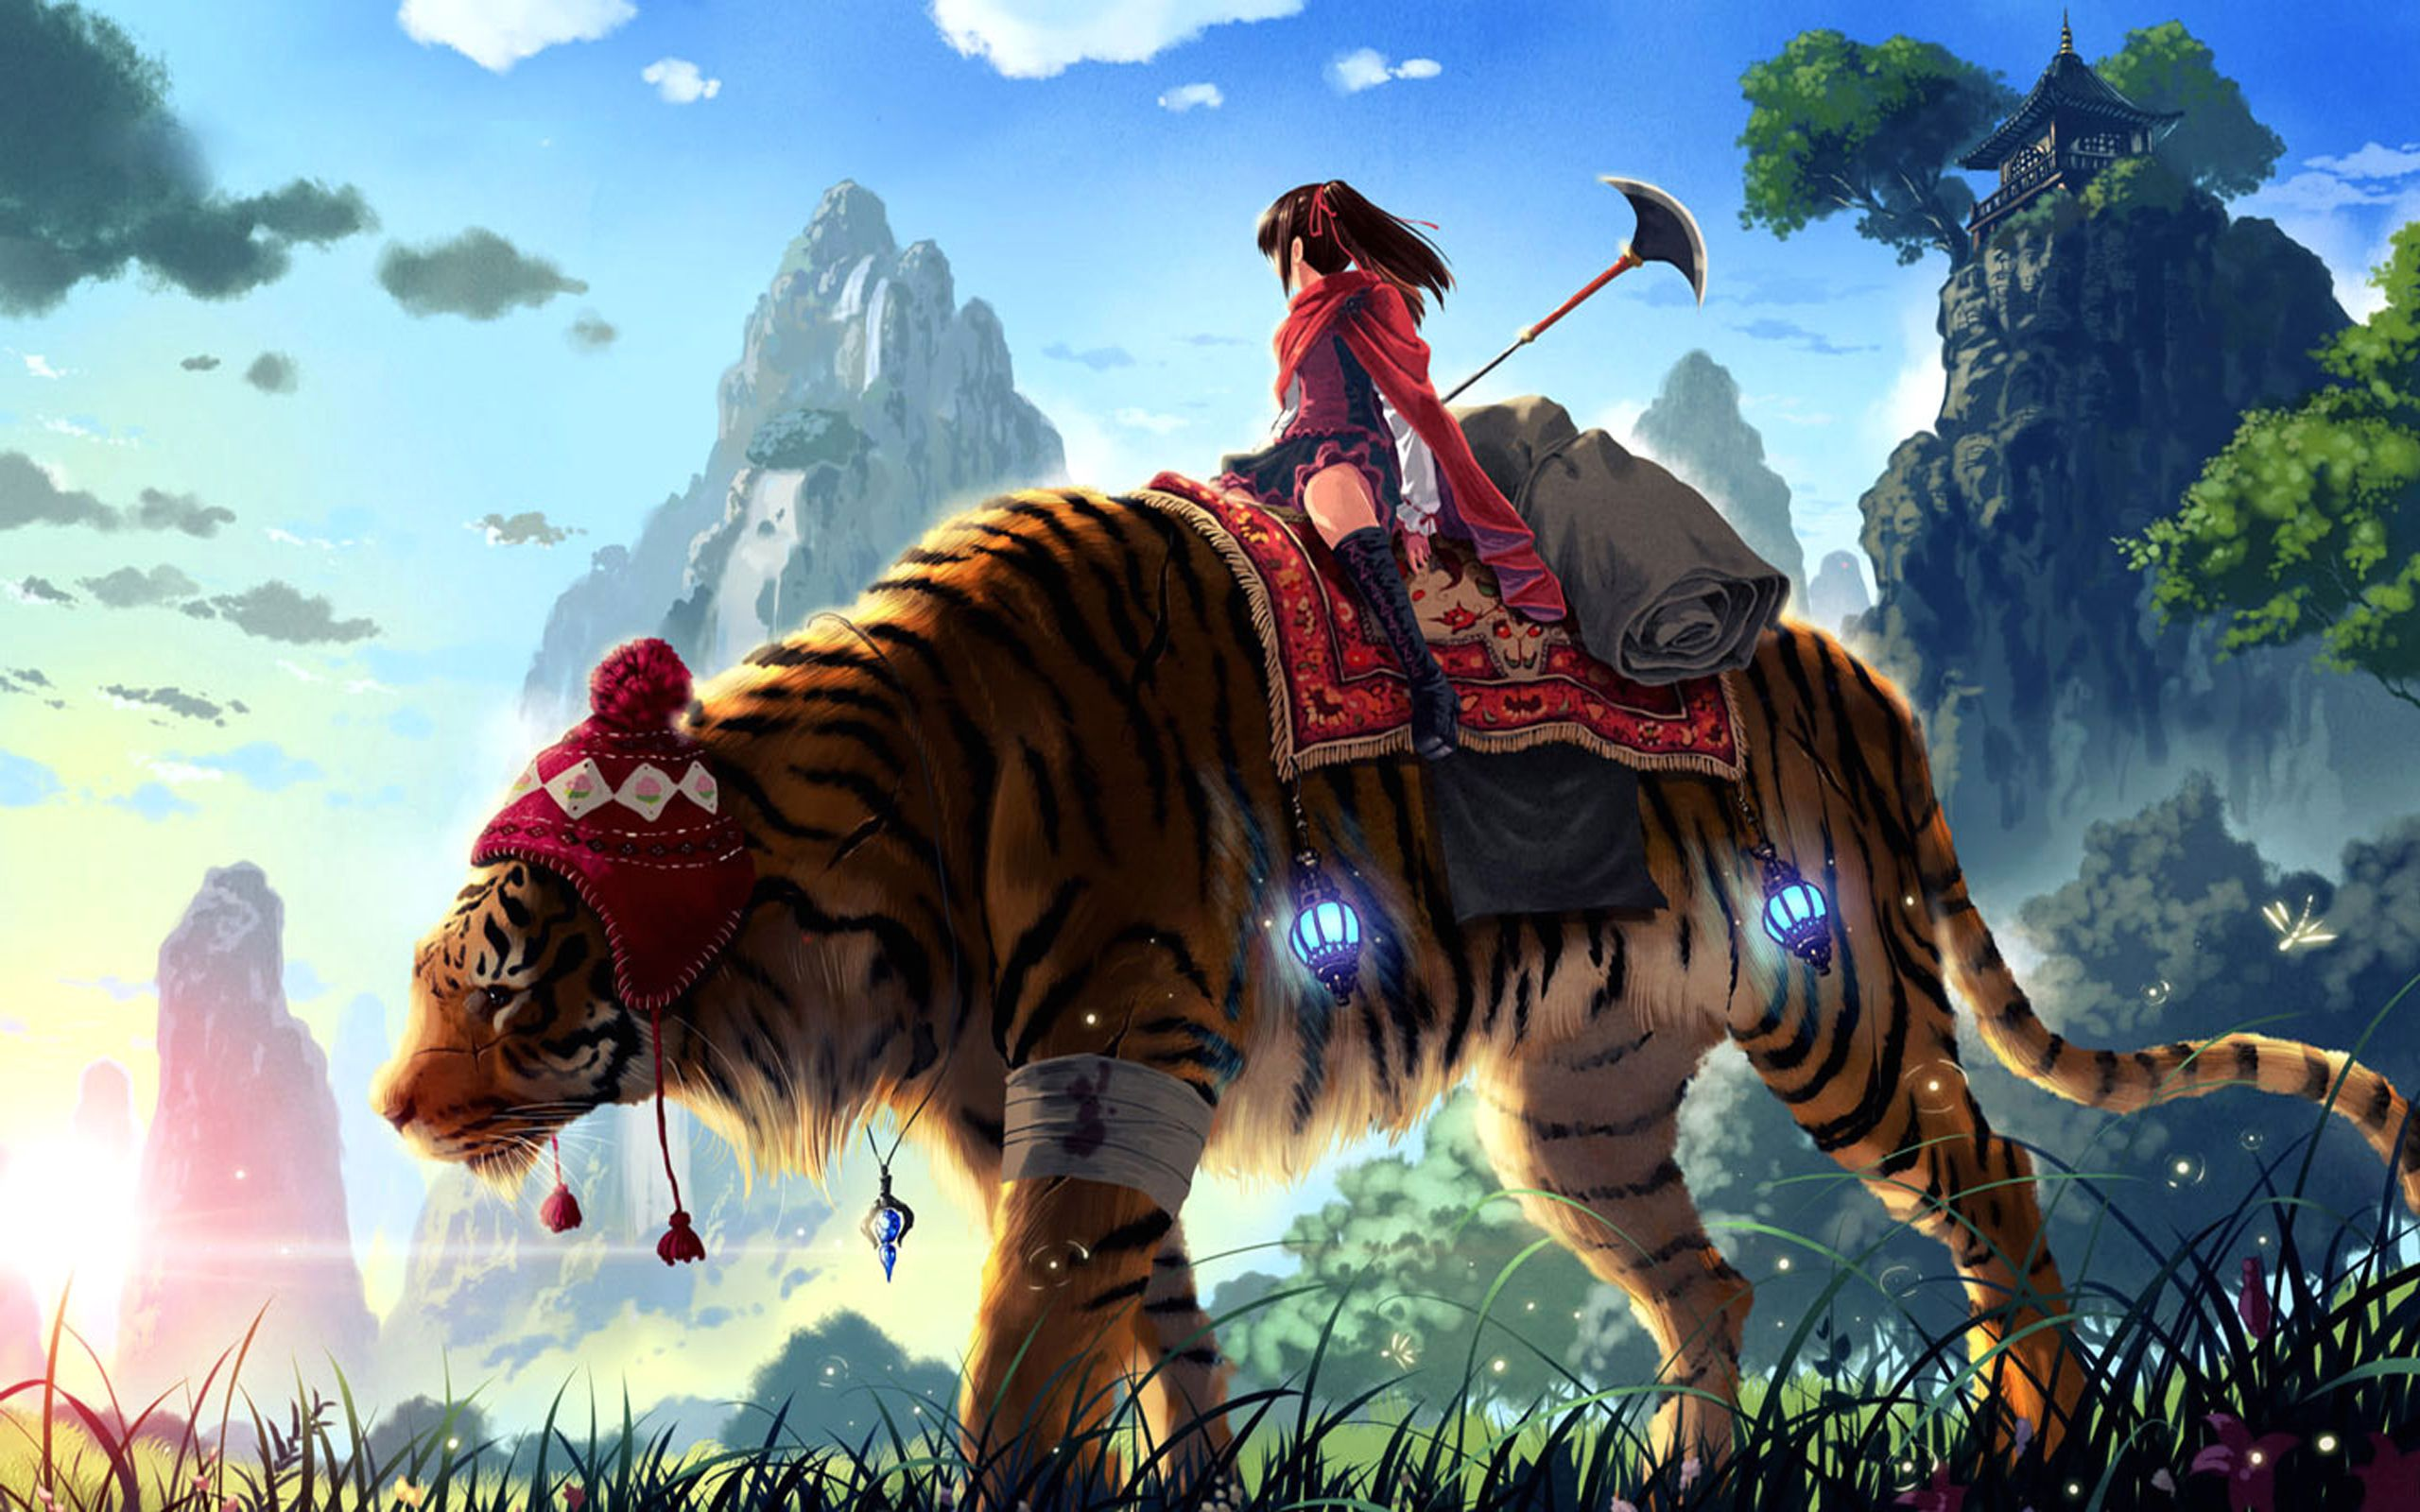 Anime - Original - Girl - Tiger - Journey Wallpaper  91fc8ed1a44d